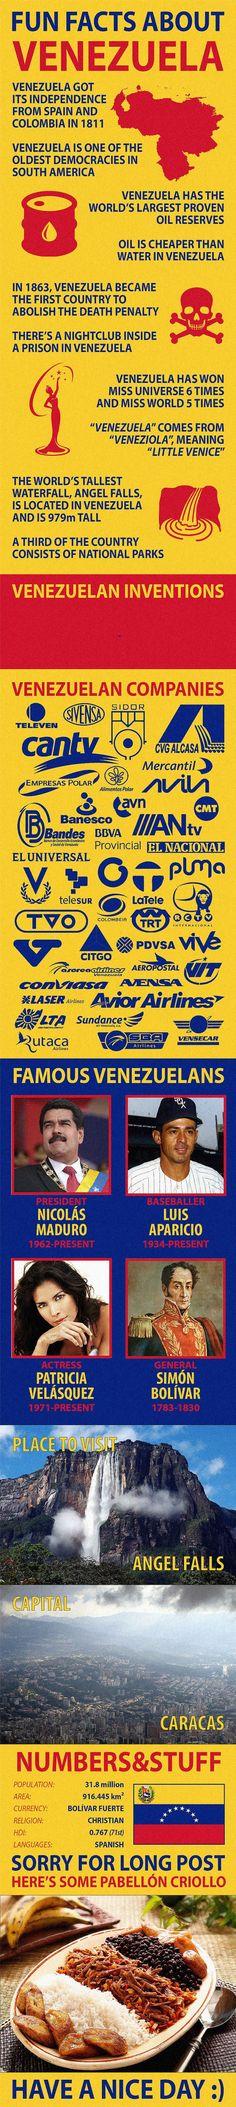 Fun Facts about Venezuela